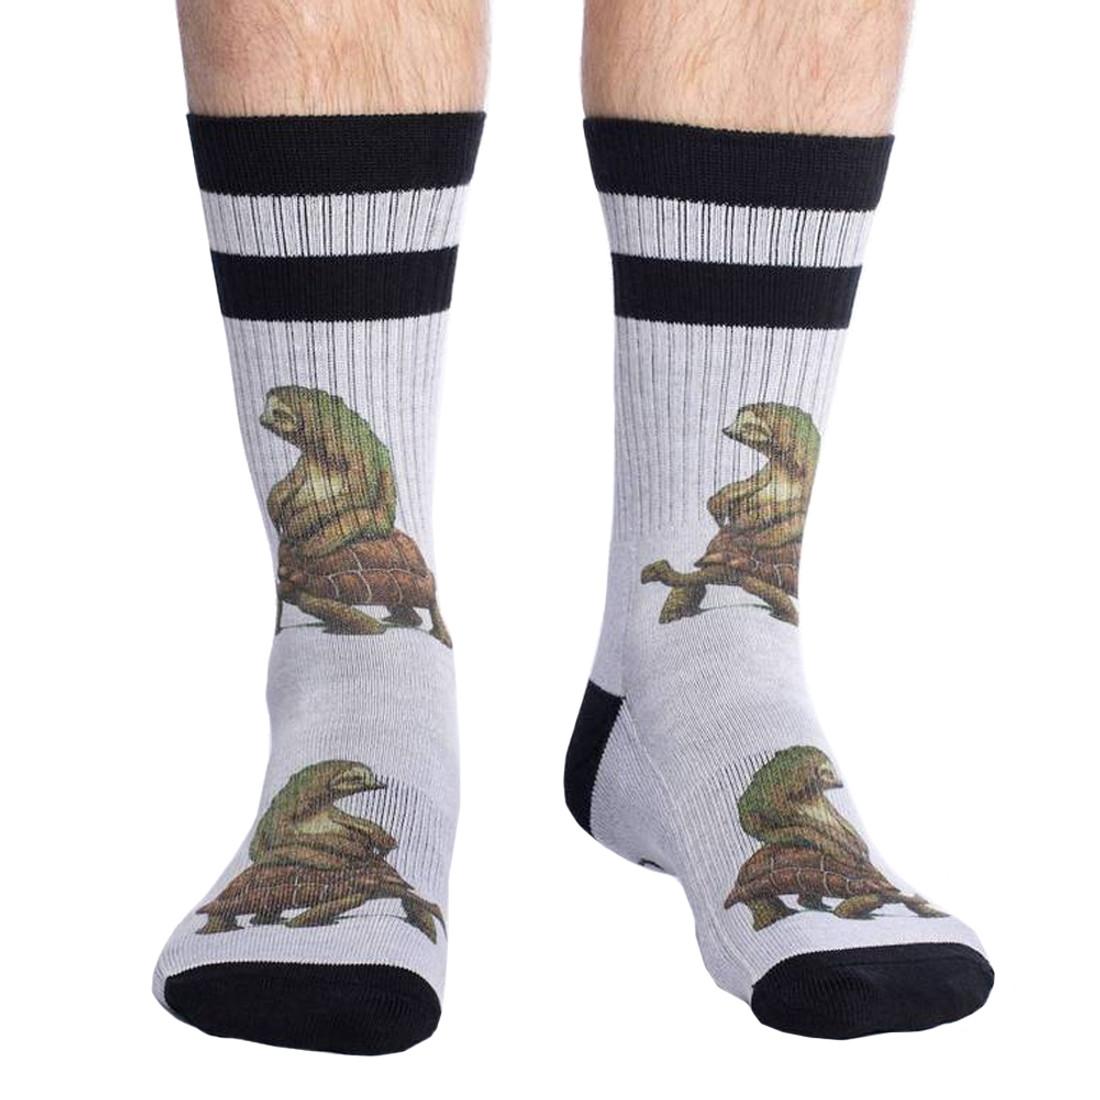 The Tortoise and The Sloth Men's Crew Socks